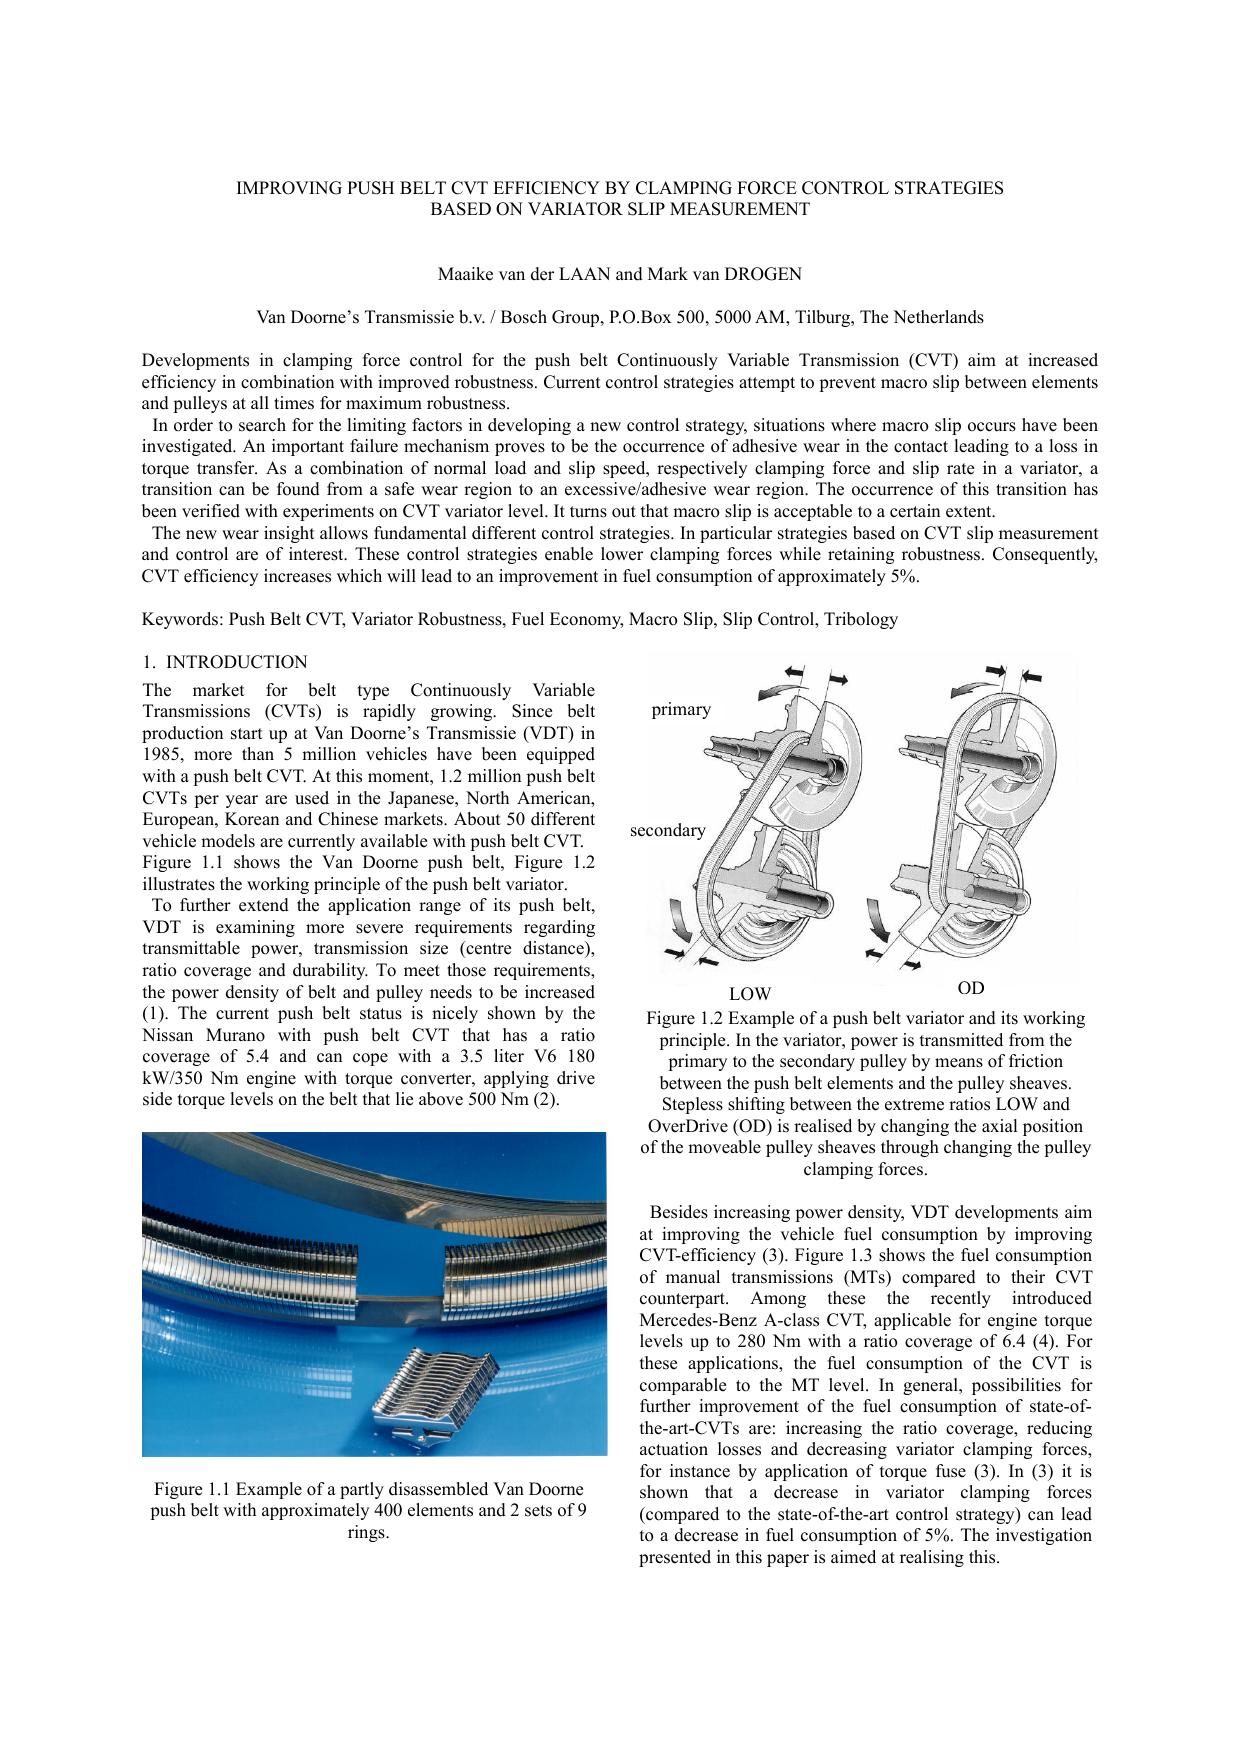 IMPROVING PUSH BELT CVT EFFICIENCY BY CLAMPING FORCE | manualzz com